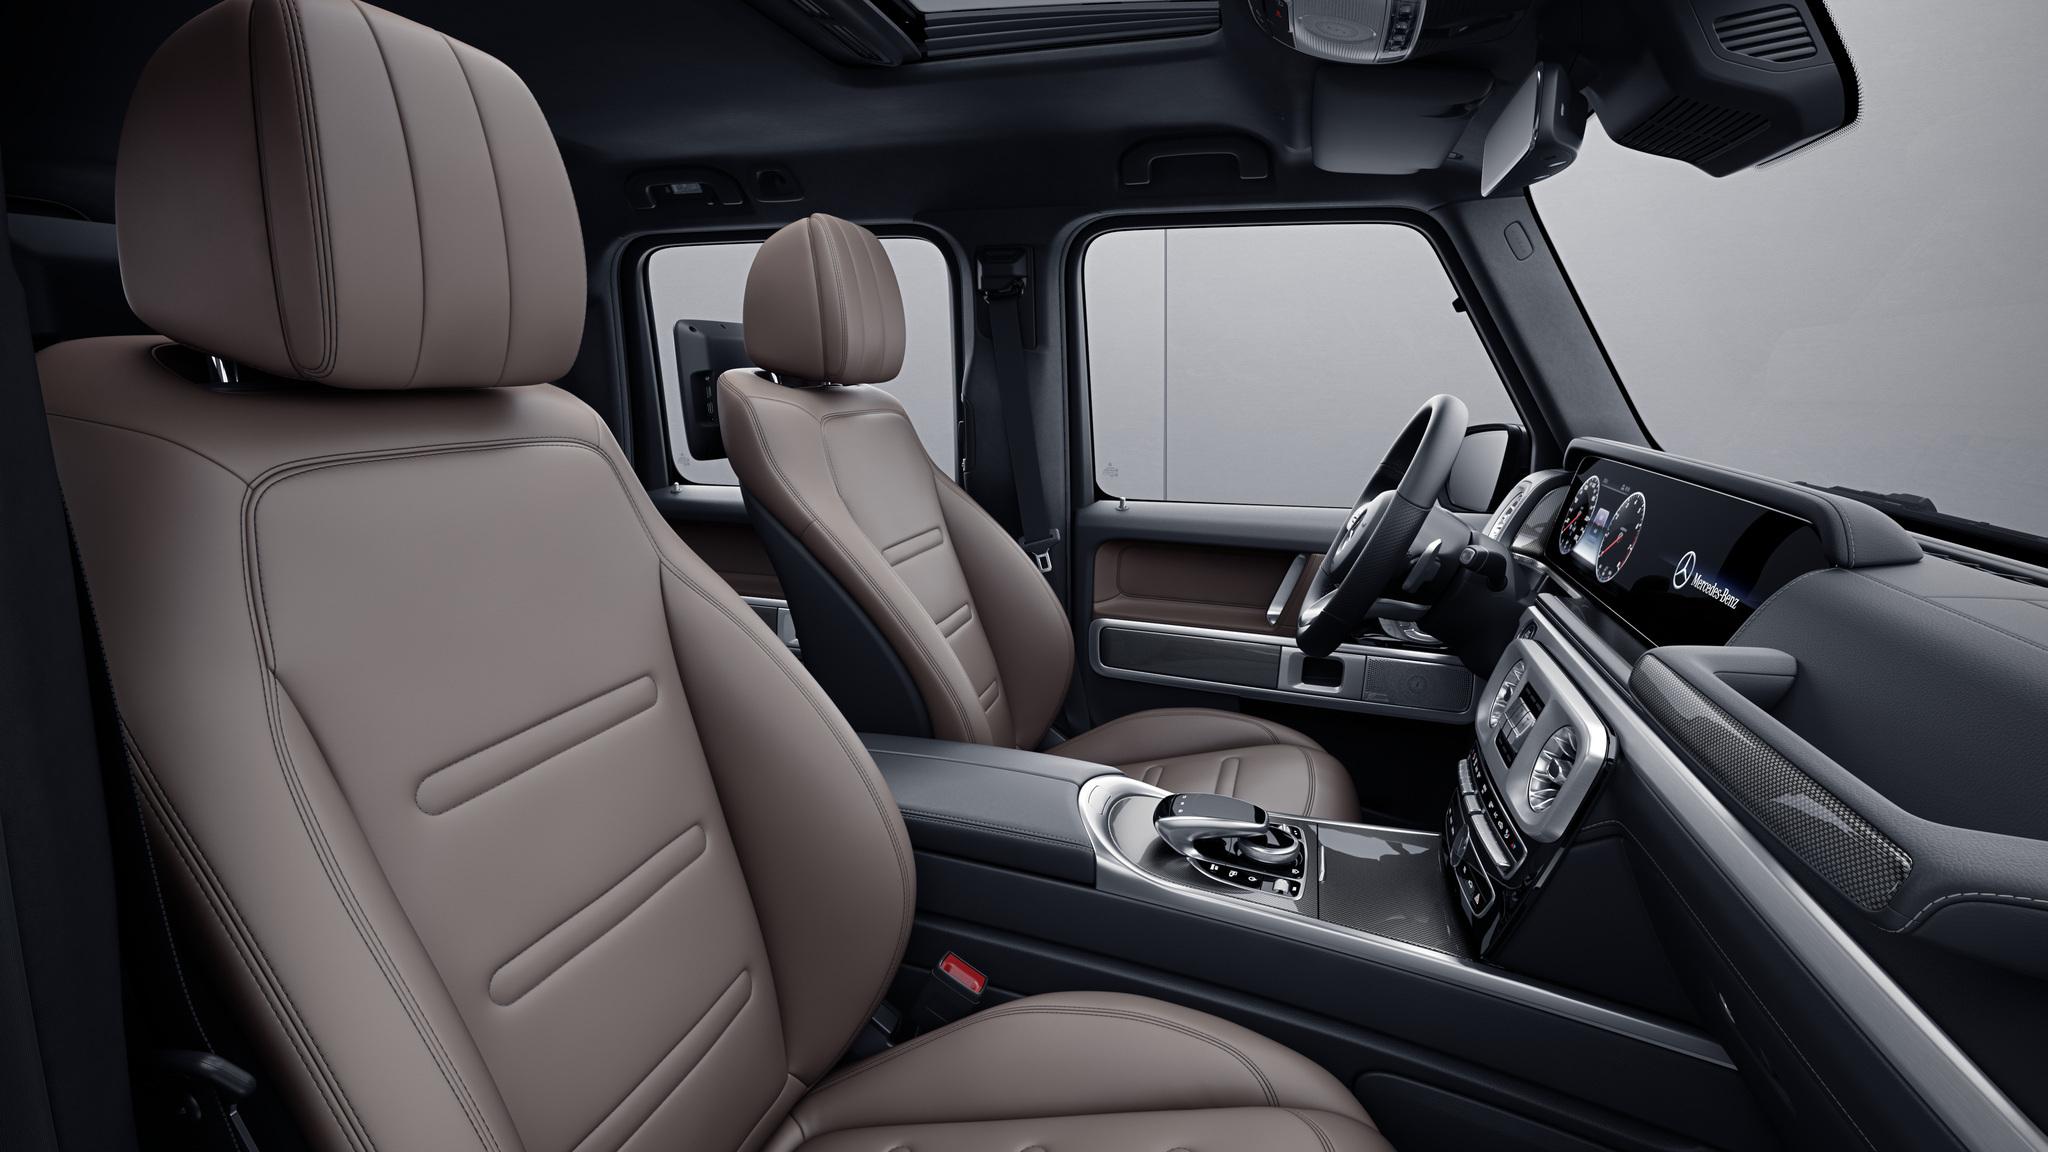 Habitacle de la Mercedes Classe G avec une Sellerie cuir nappa bicolore - maron tartuffe noir